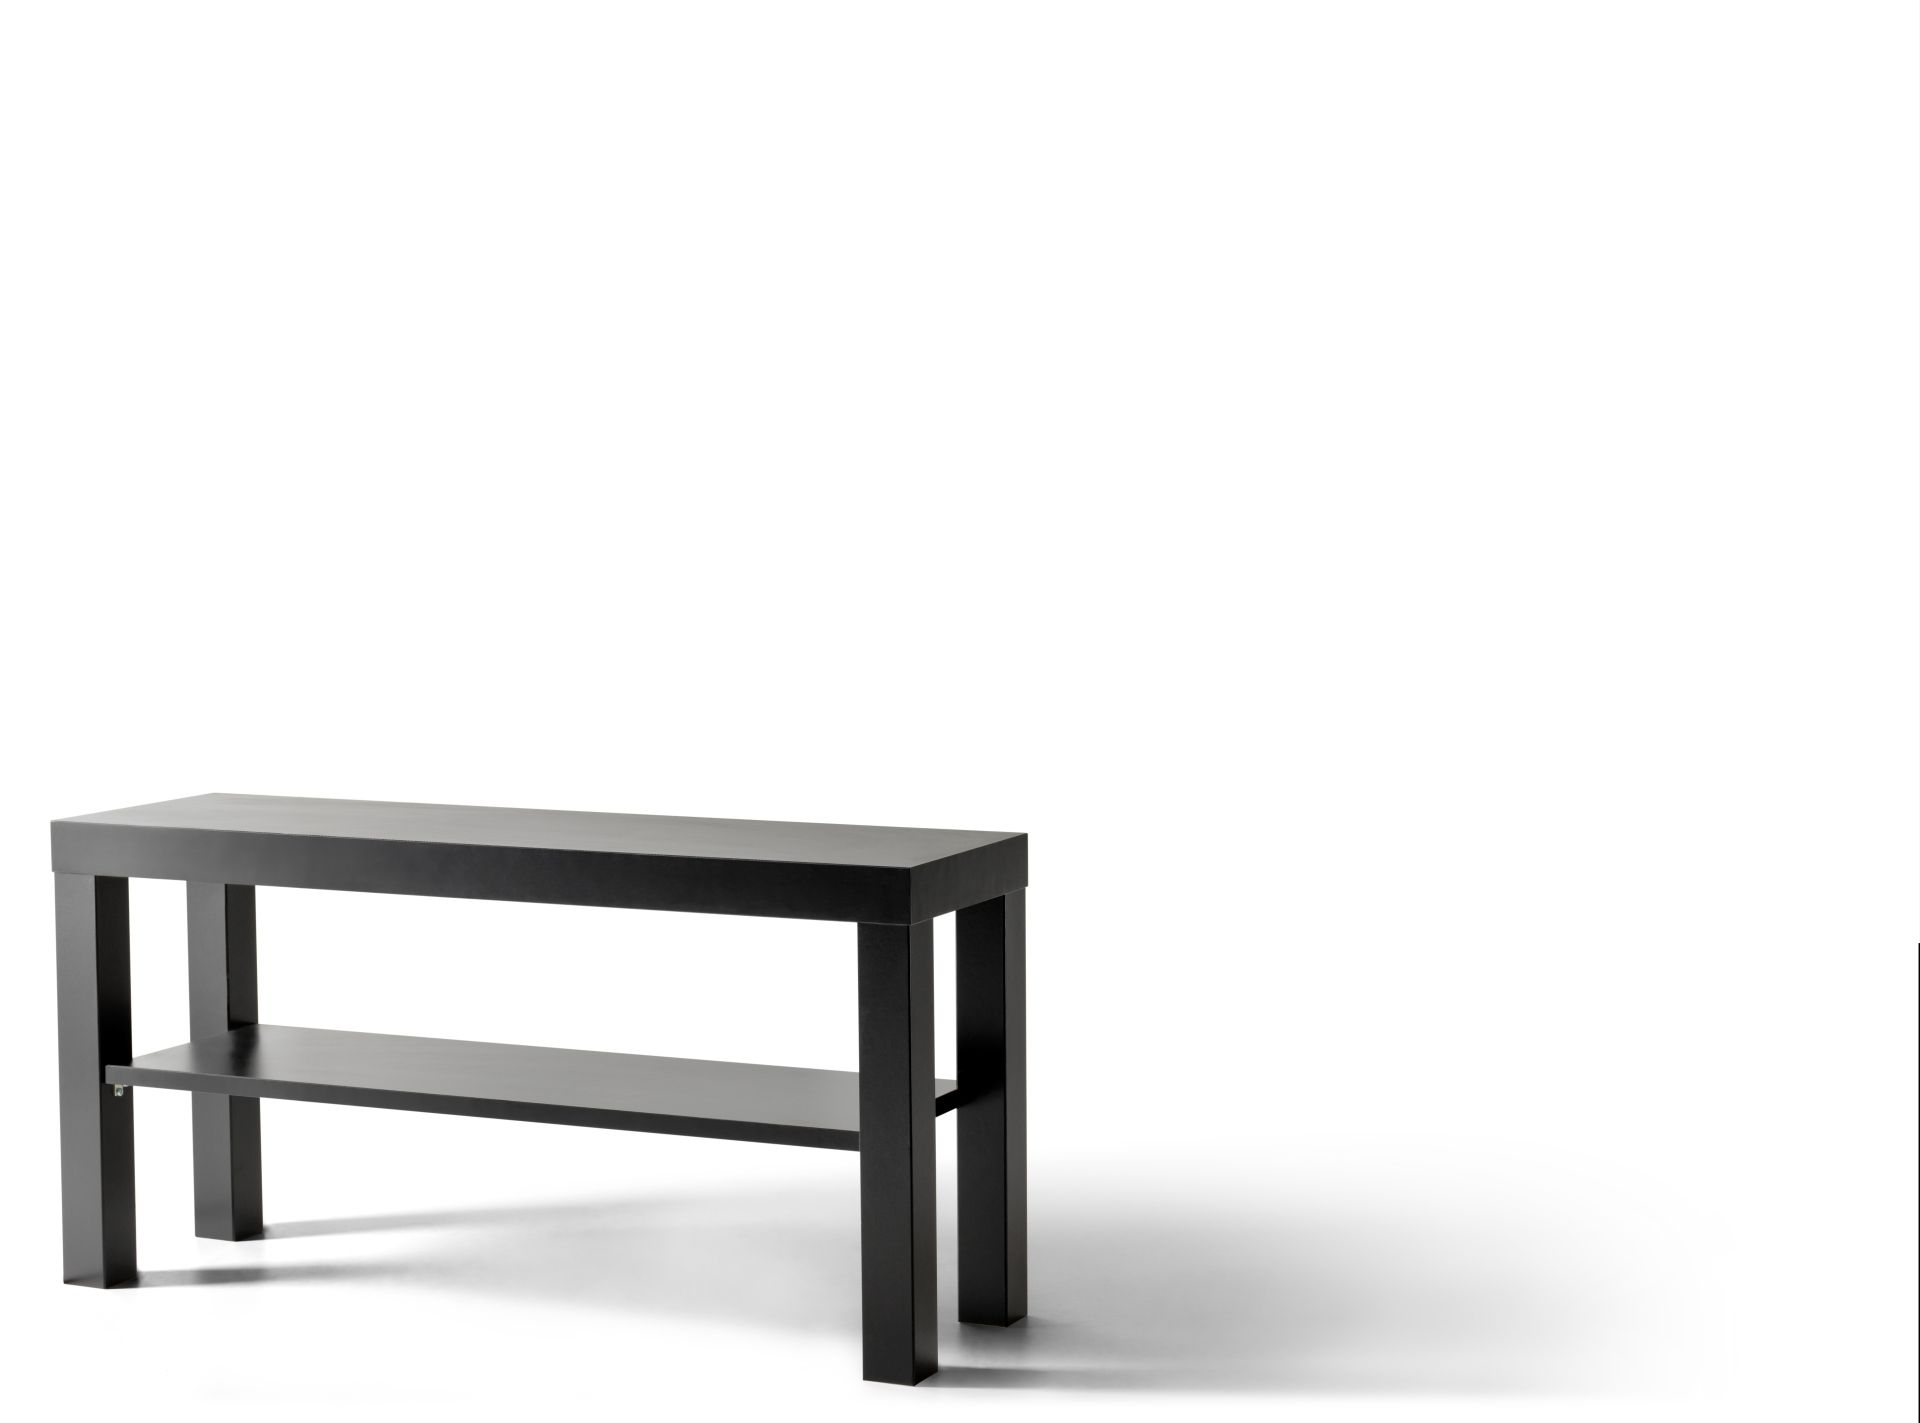 Lack Tv Meubel Zwart Ikea Catalogus 2017 Tv Meubels